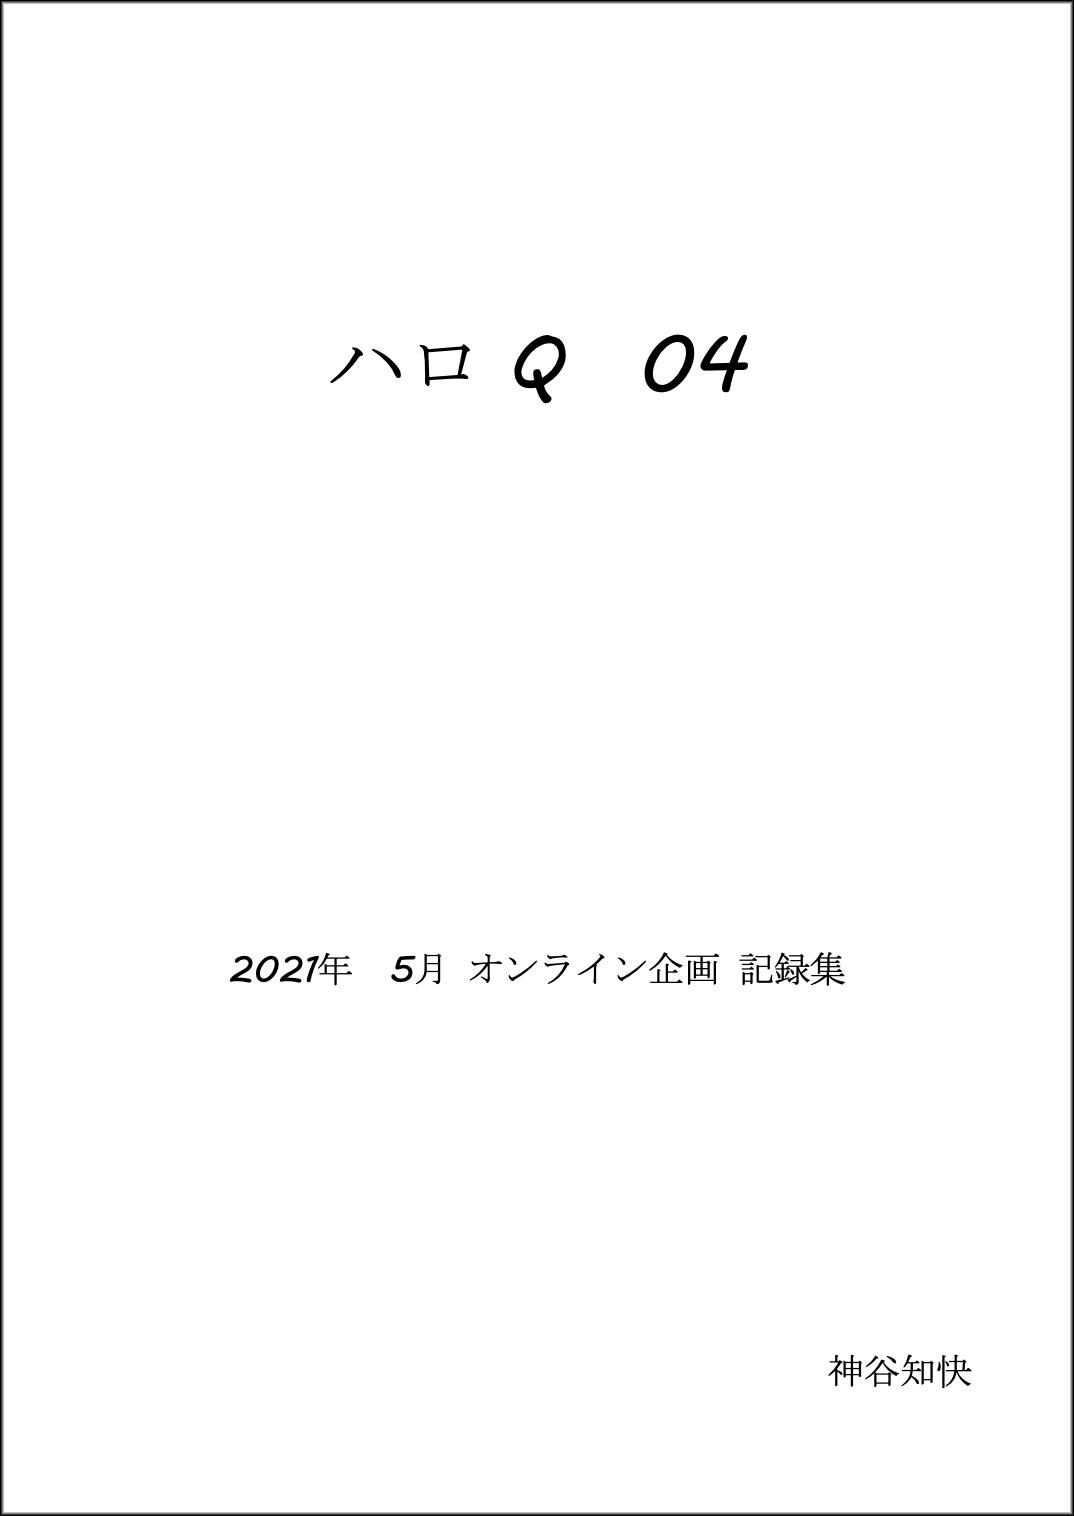 C33162039